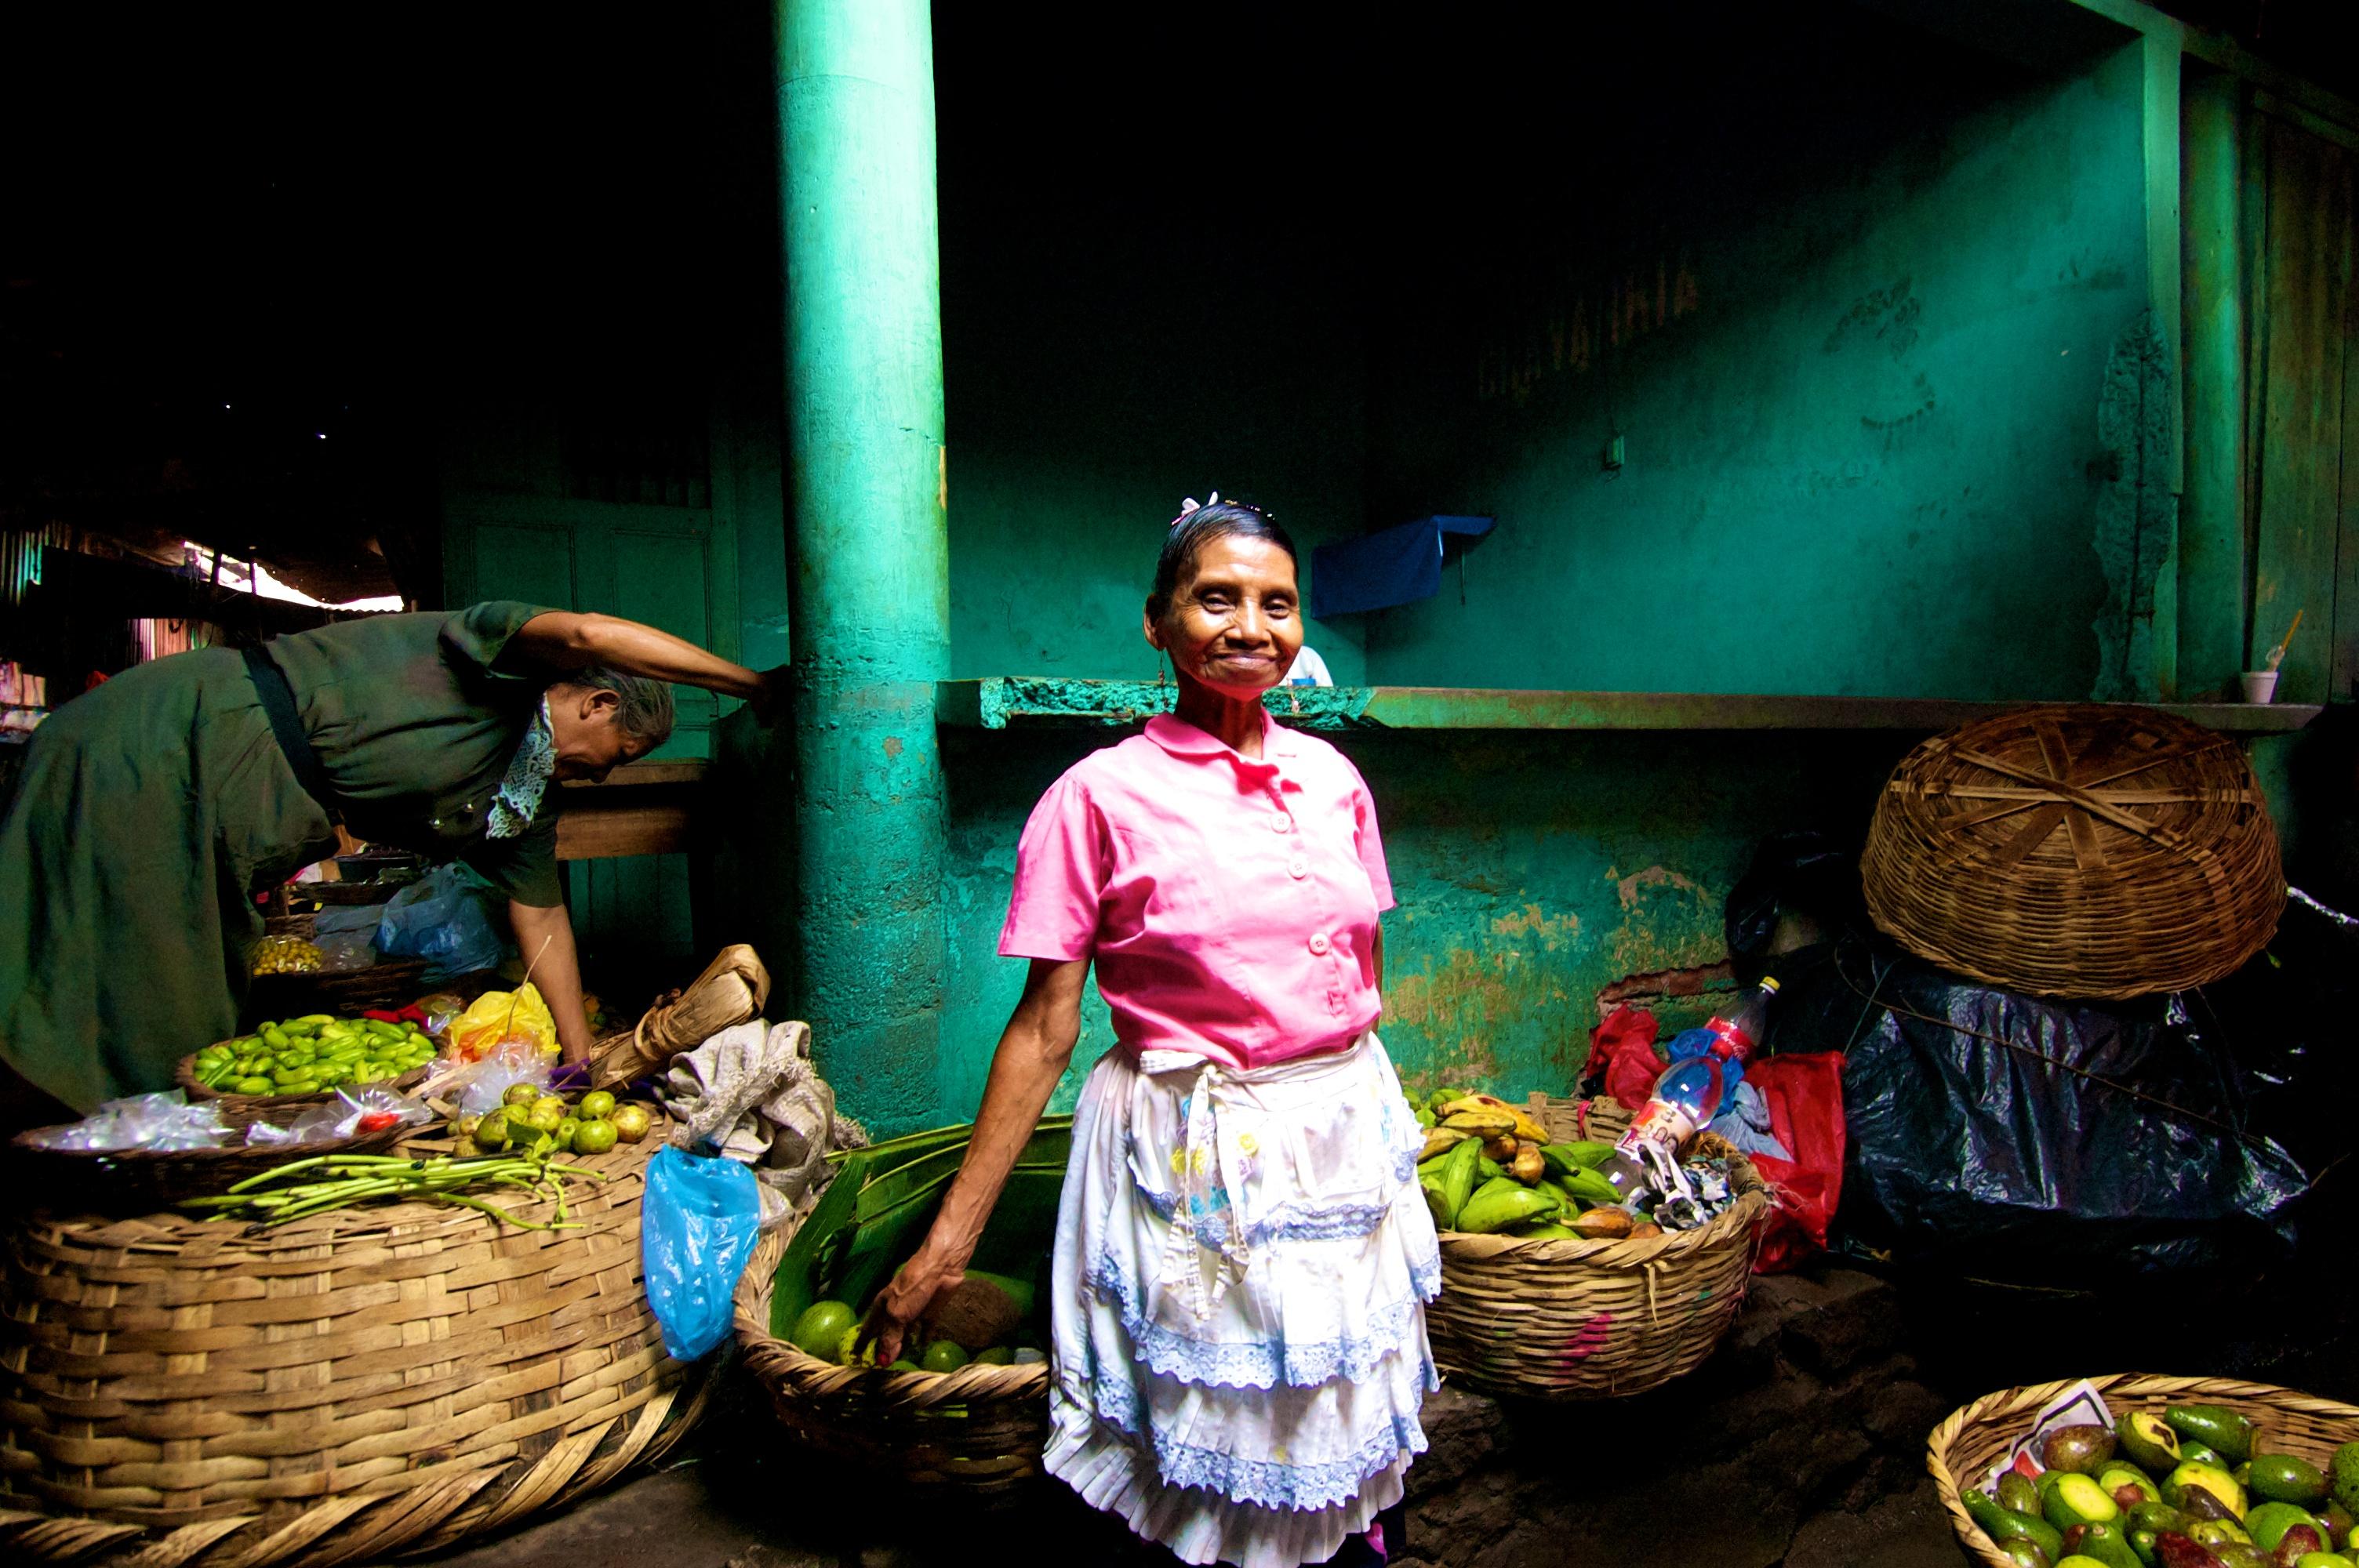 Beautiful lighting in Granada market in Nicaragua